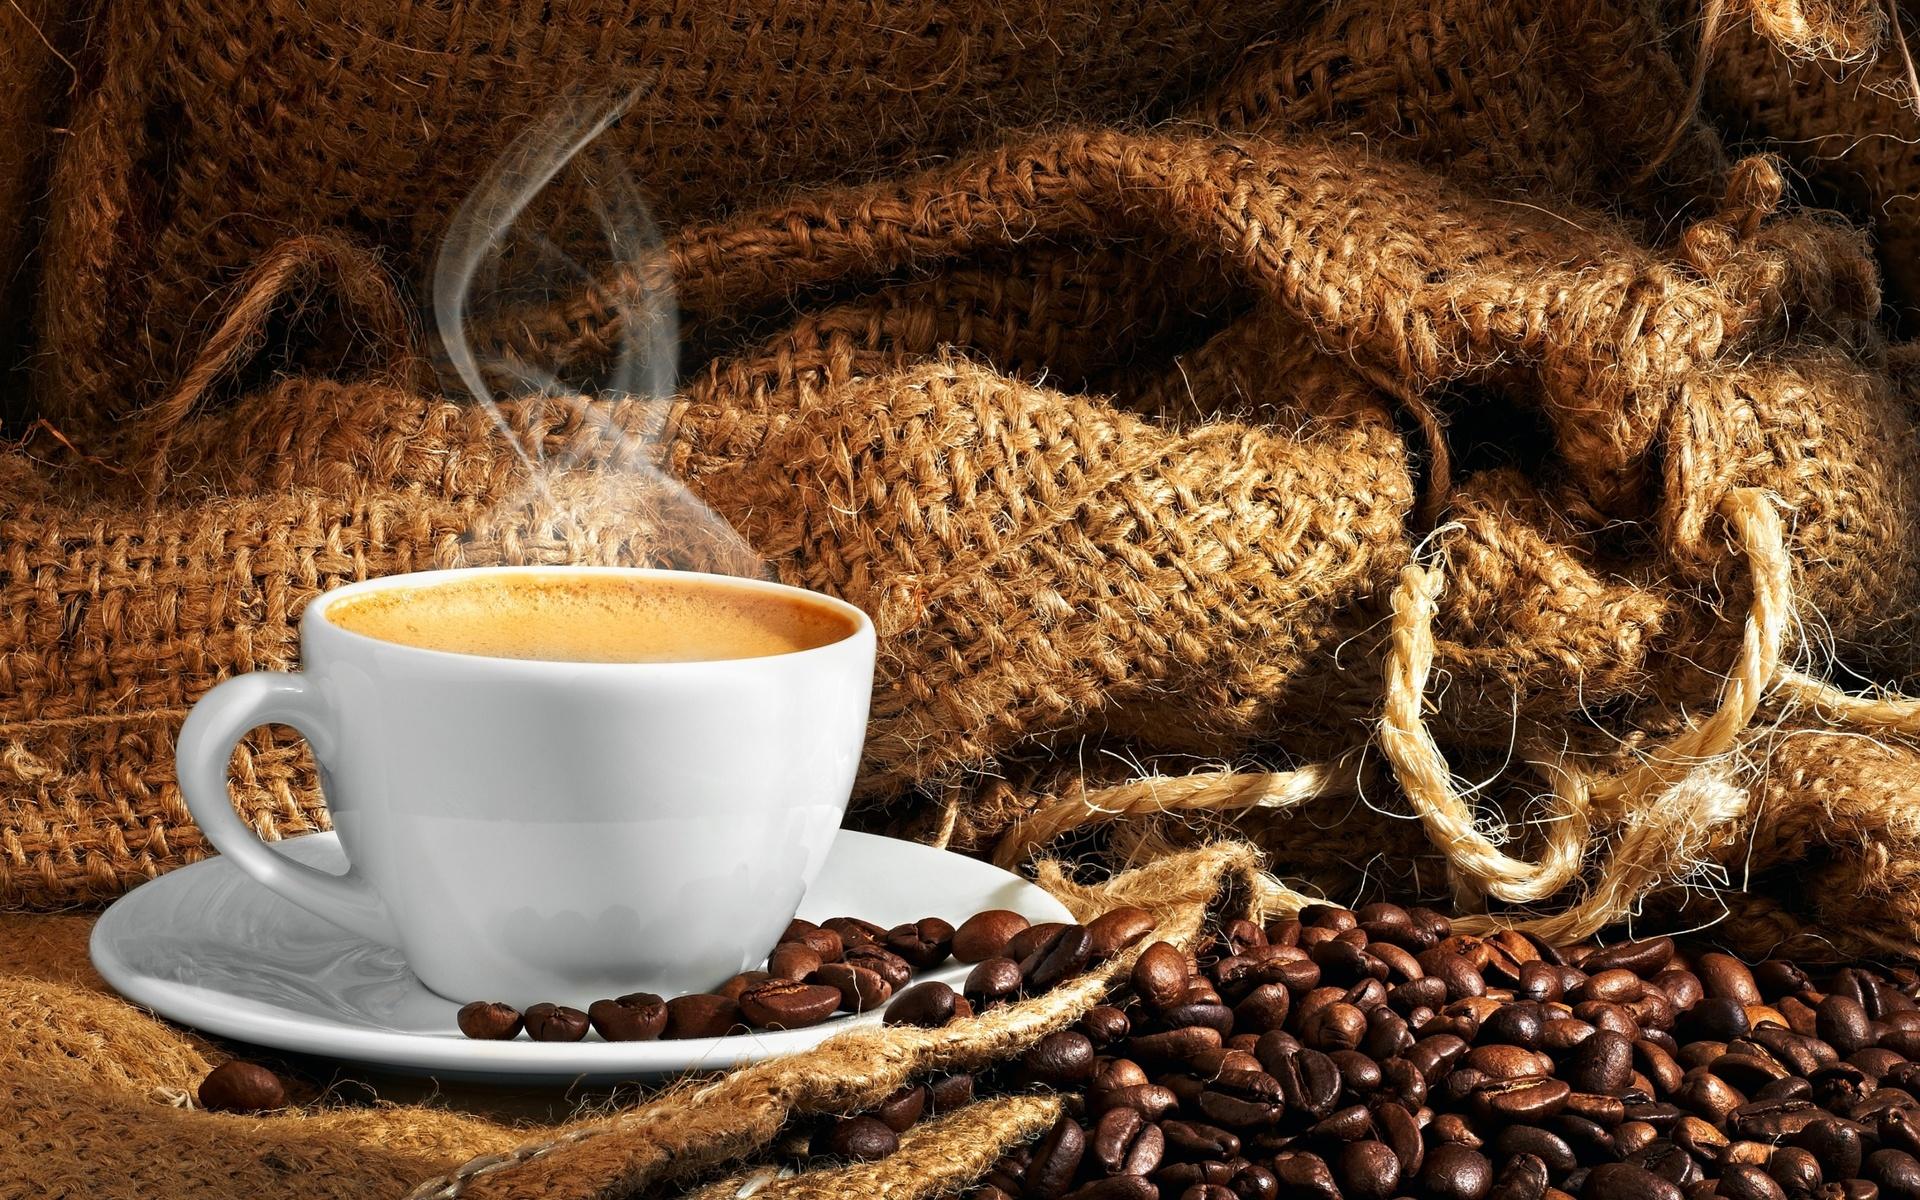 Кофе для картинки, создай открытку